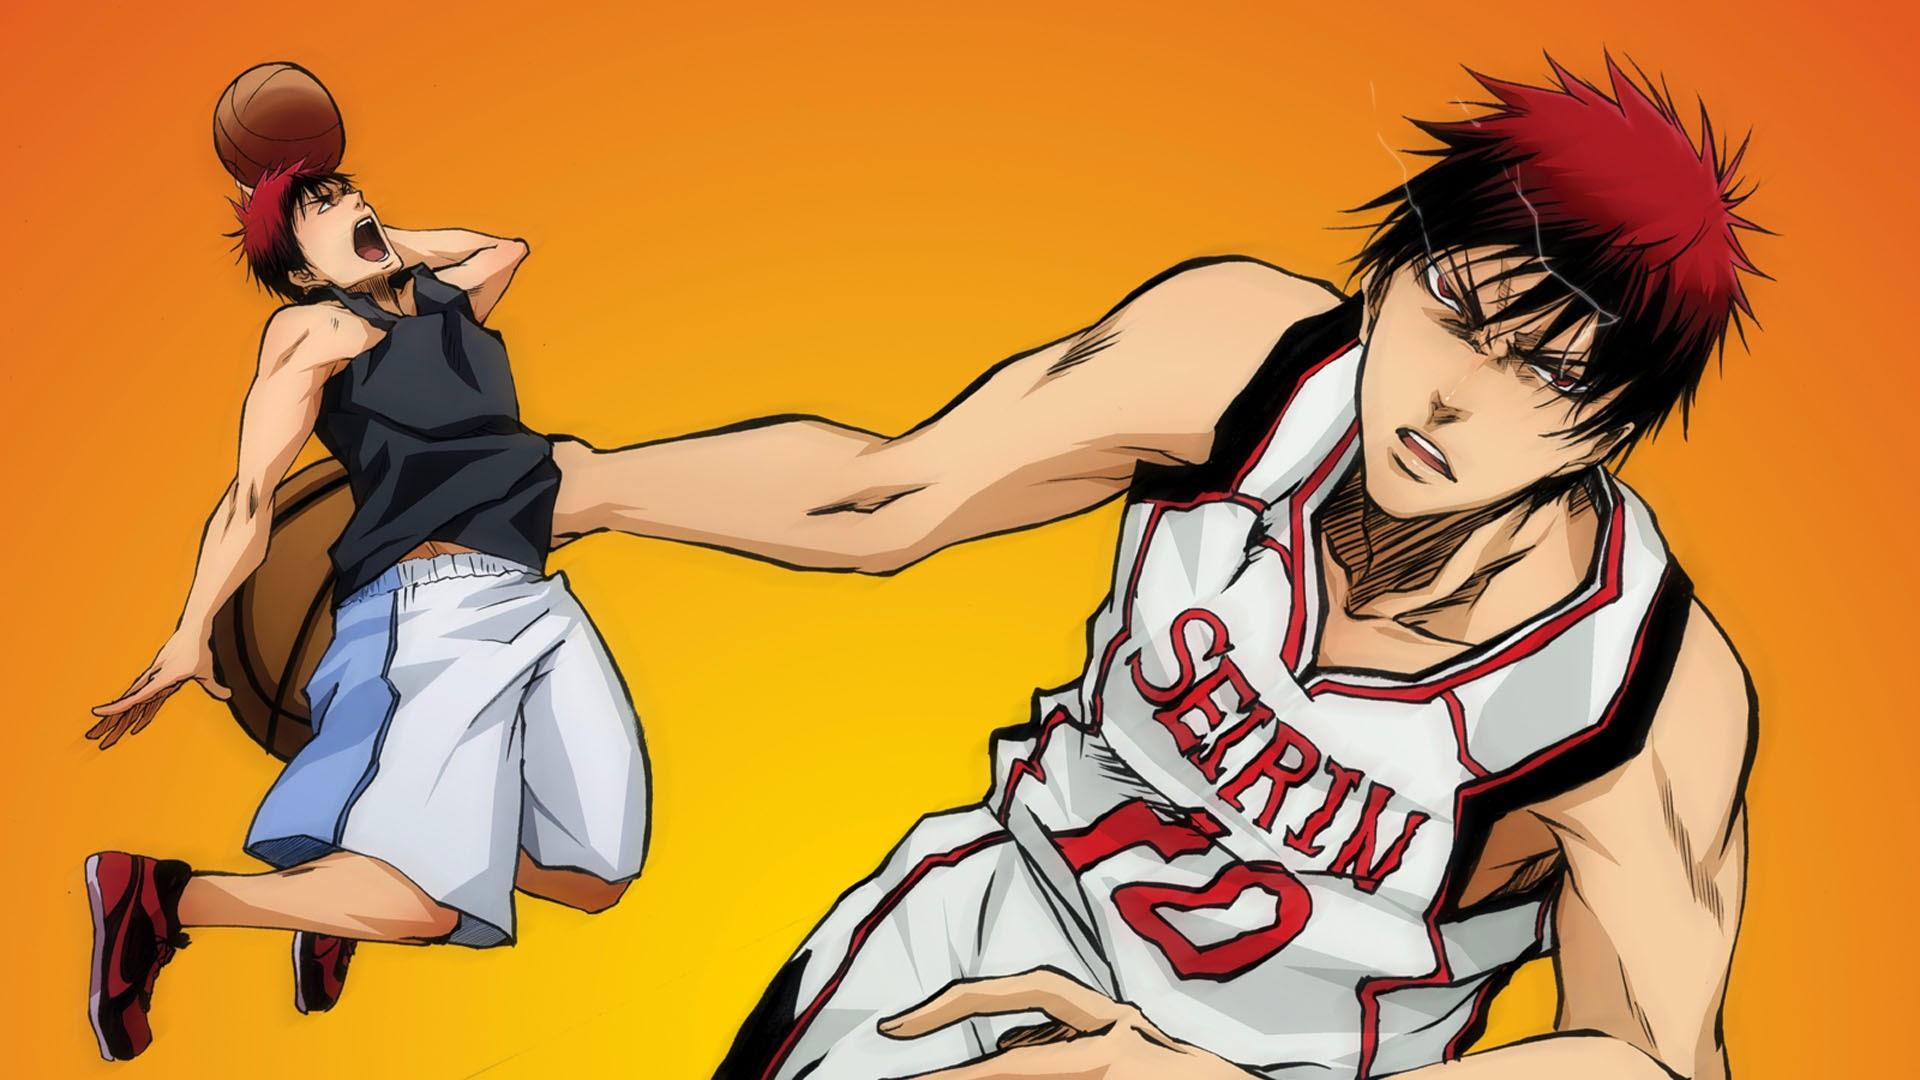 [49+] Kuroko Basketball Wallpaper on WallpaperSafari